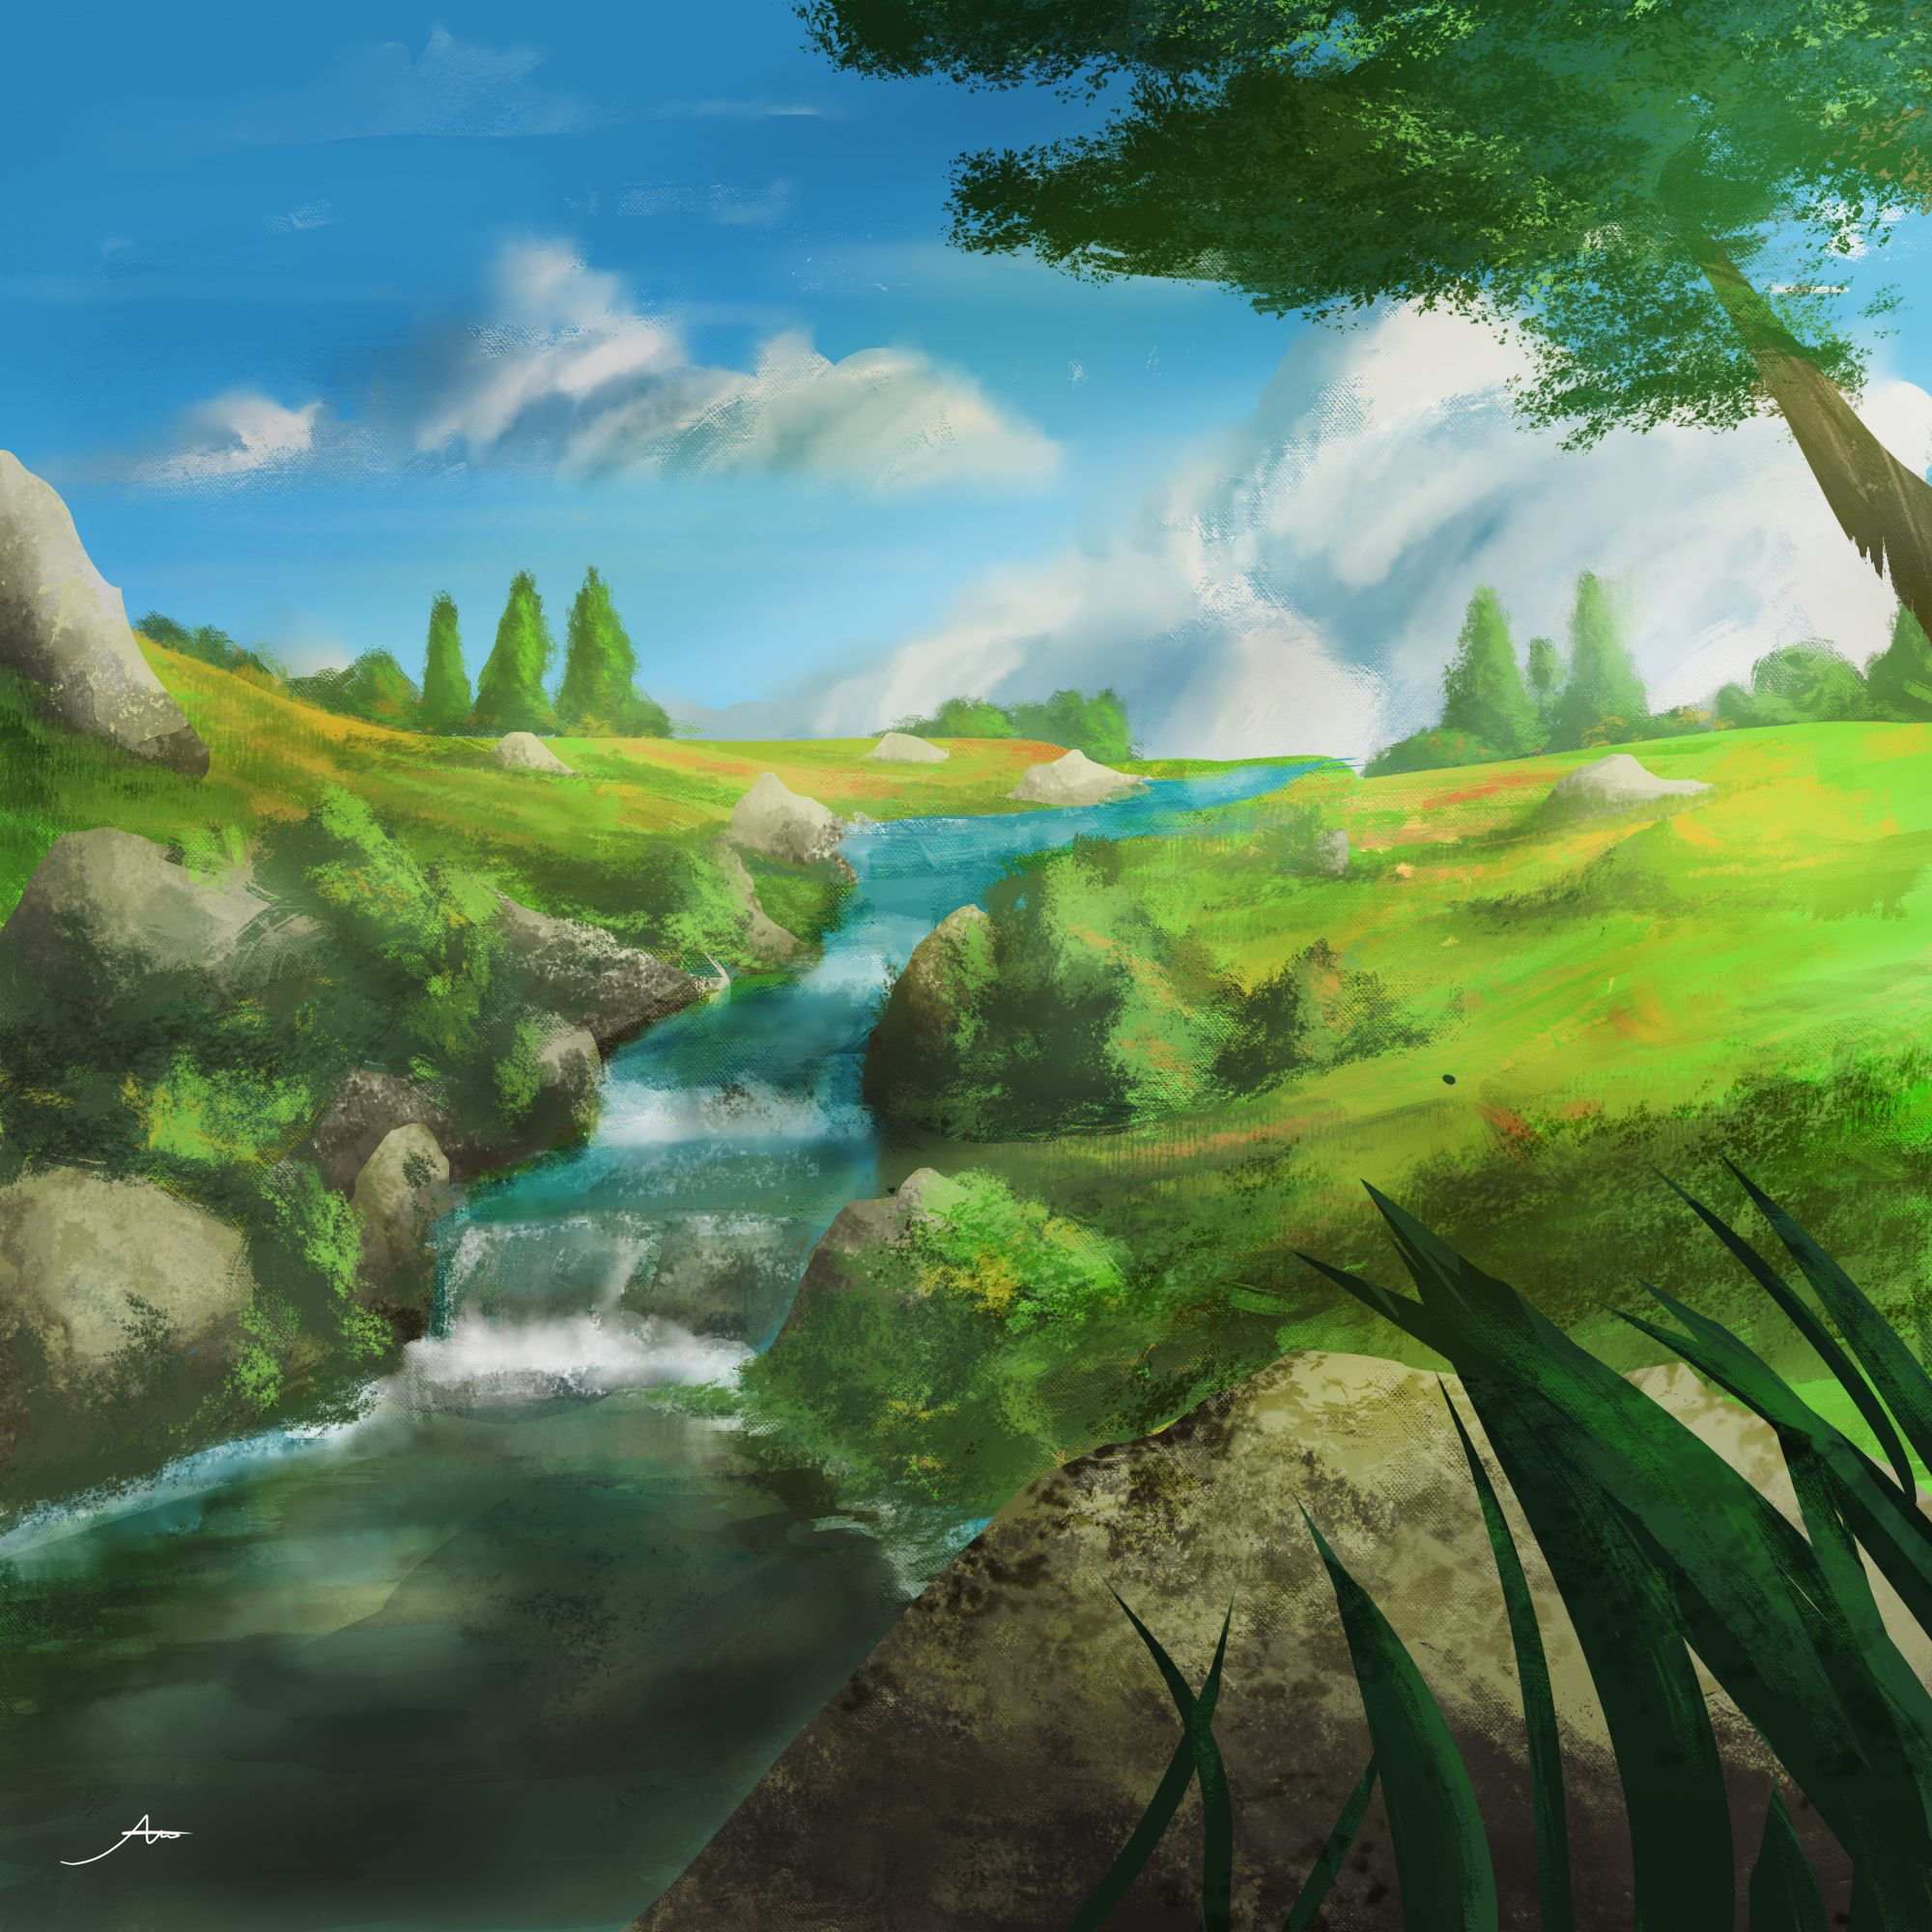 Green Field With Small River Green Landscape River Calm